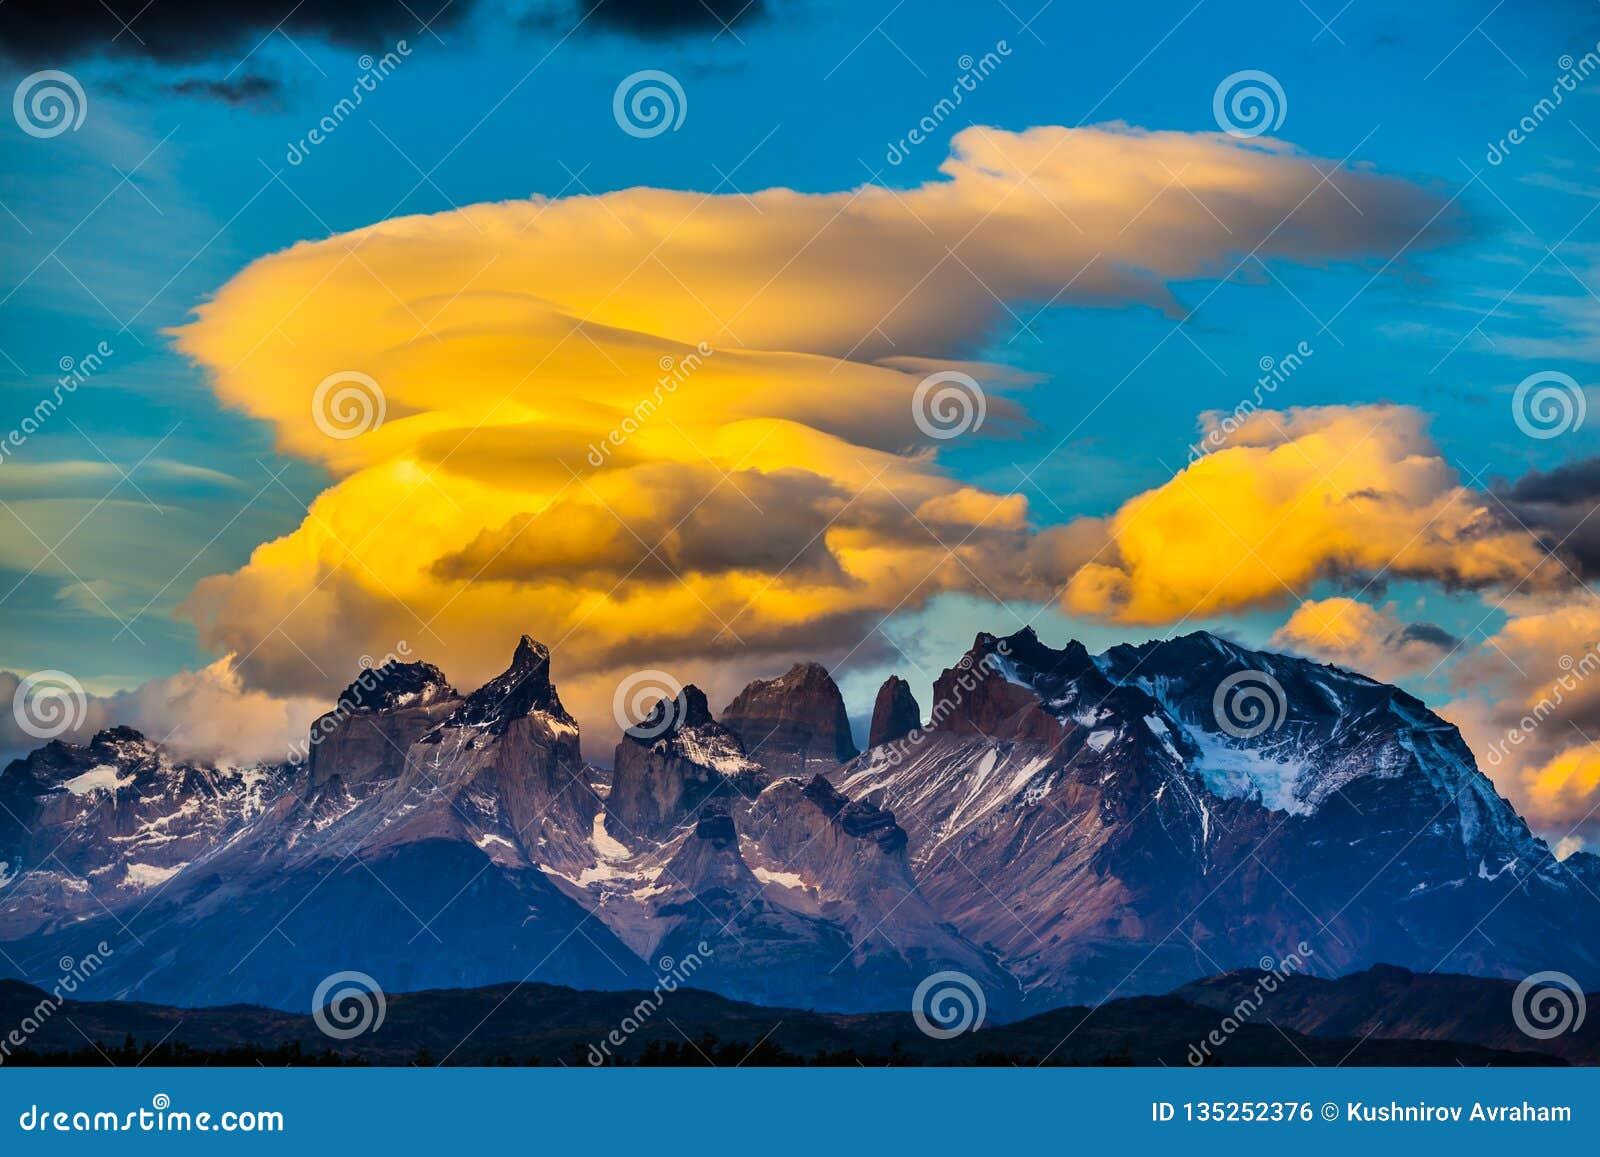 Magnificent orange clouds